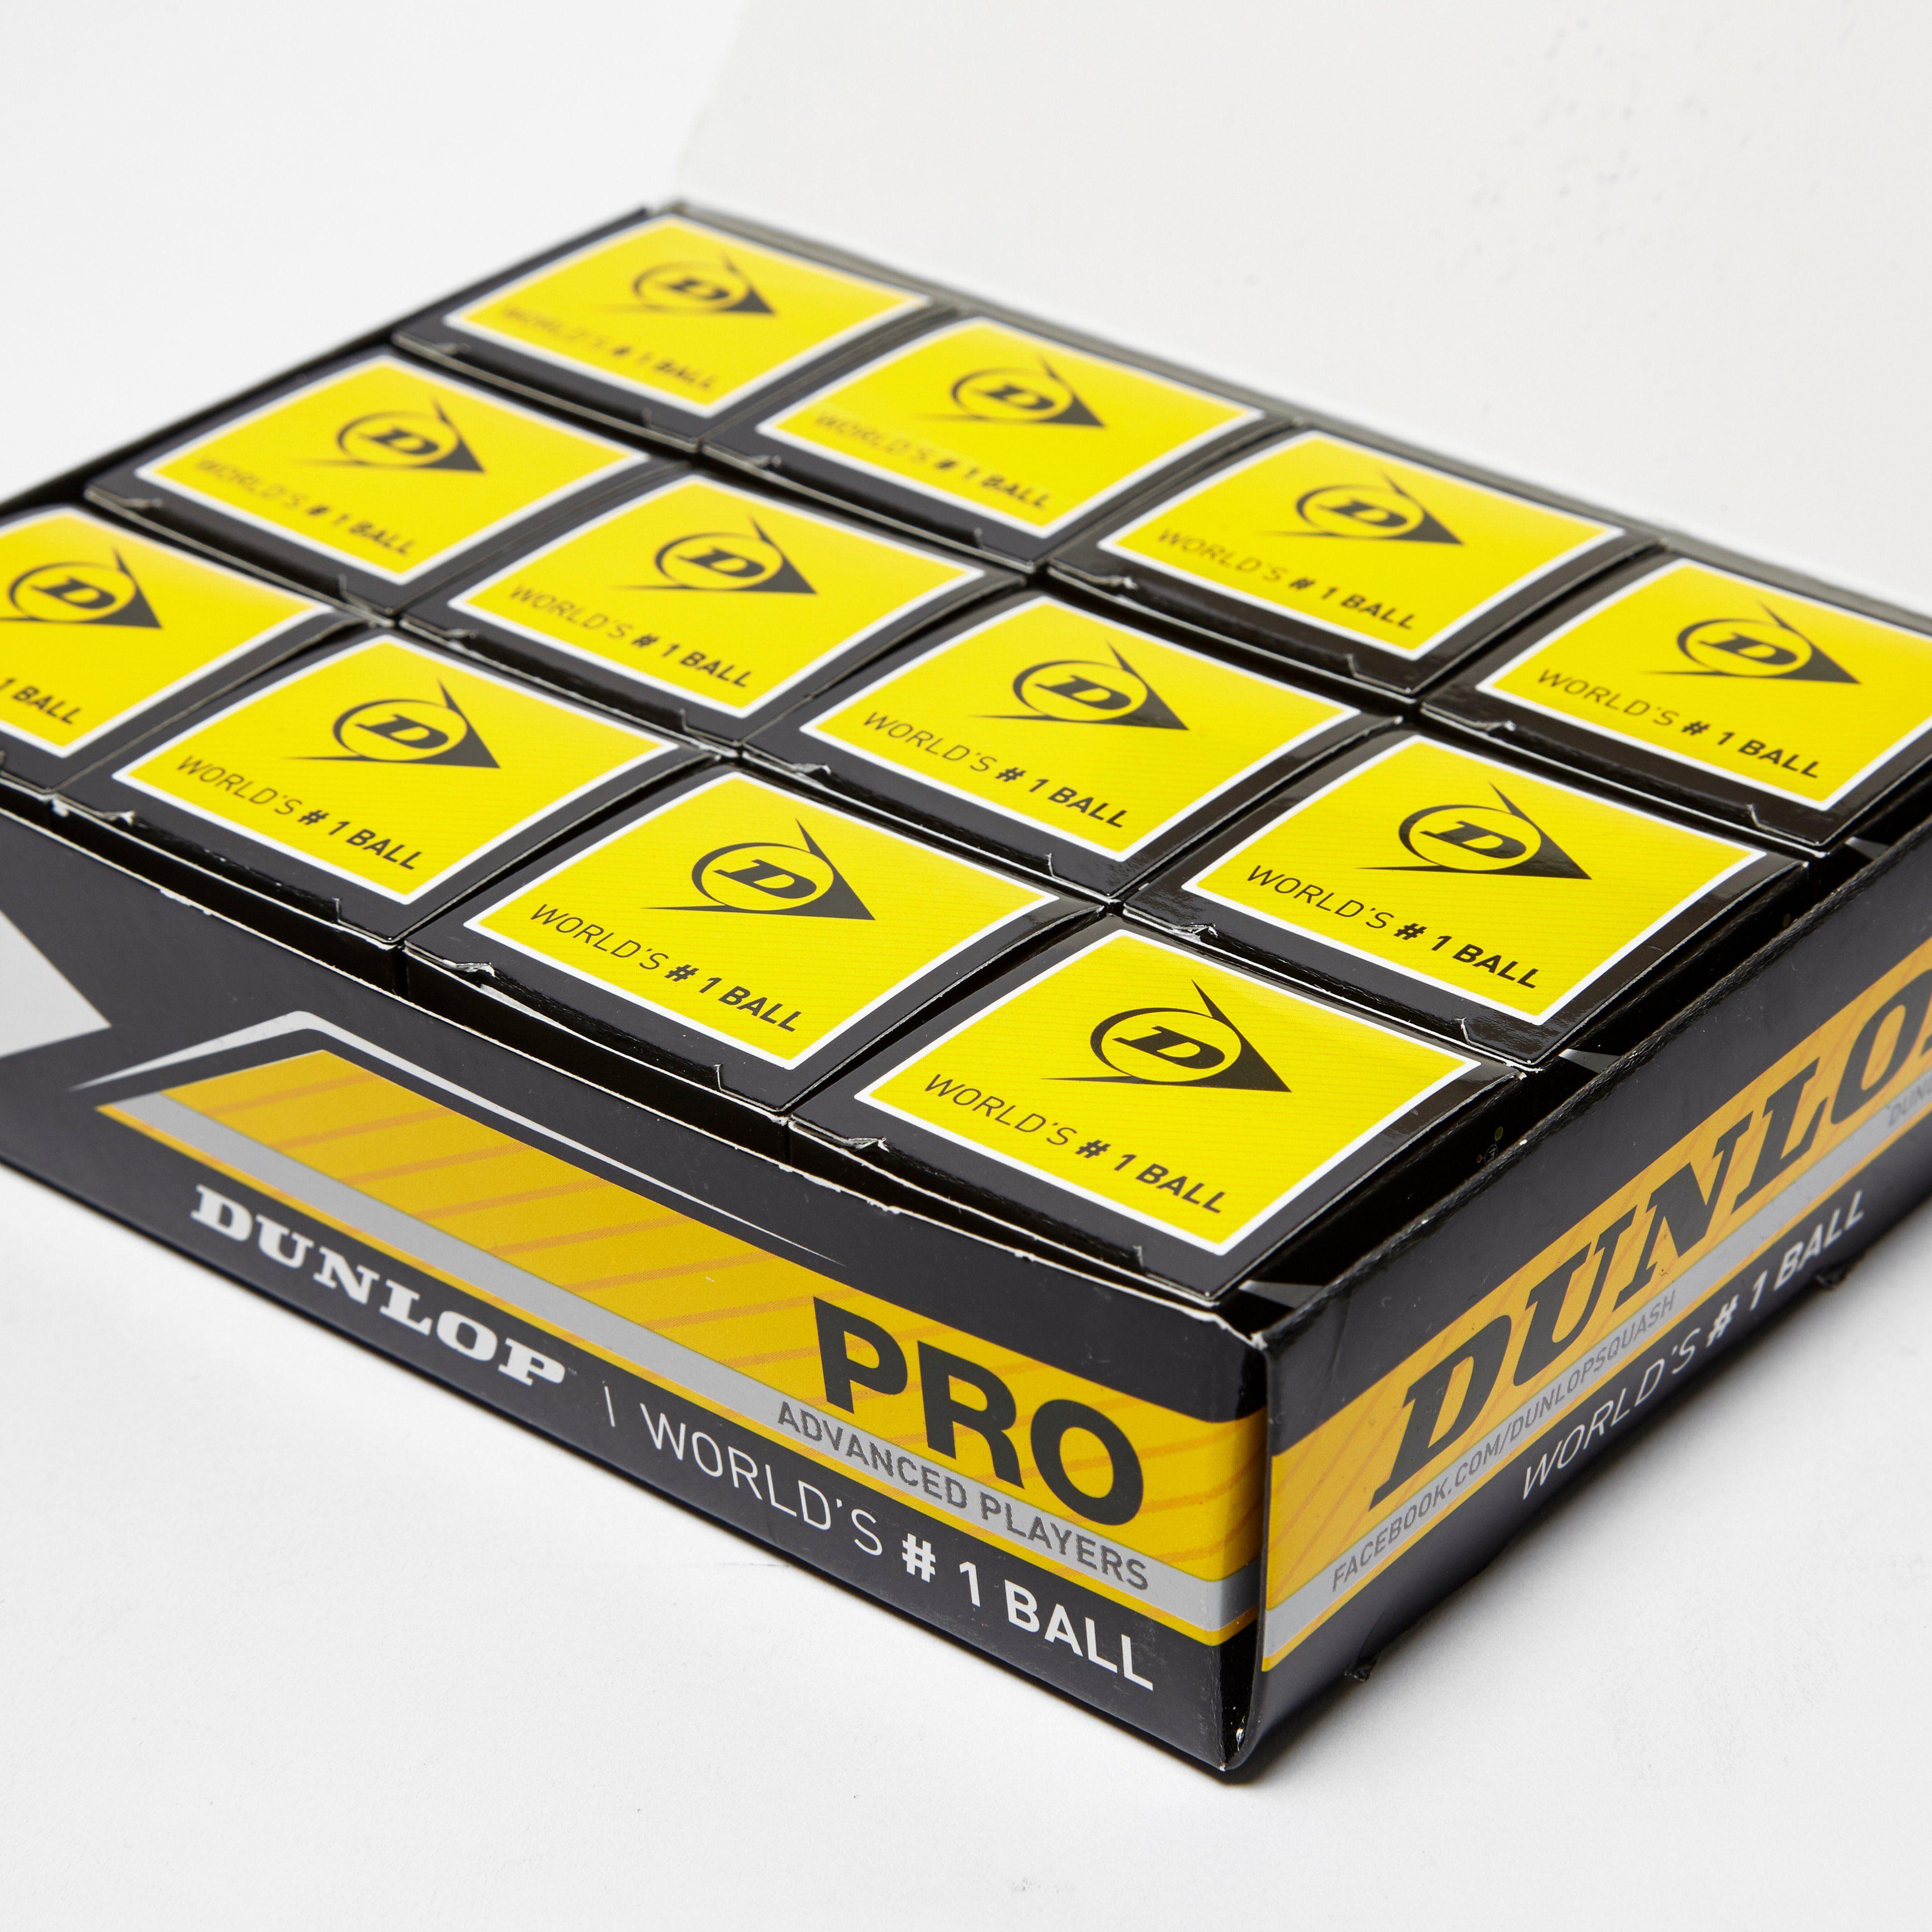 Dunlop Pro Squash Balls (12 Ball Box)